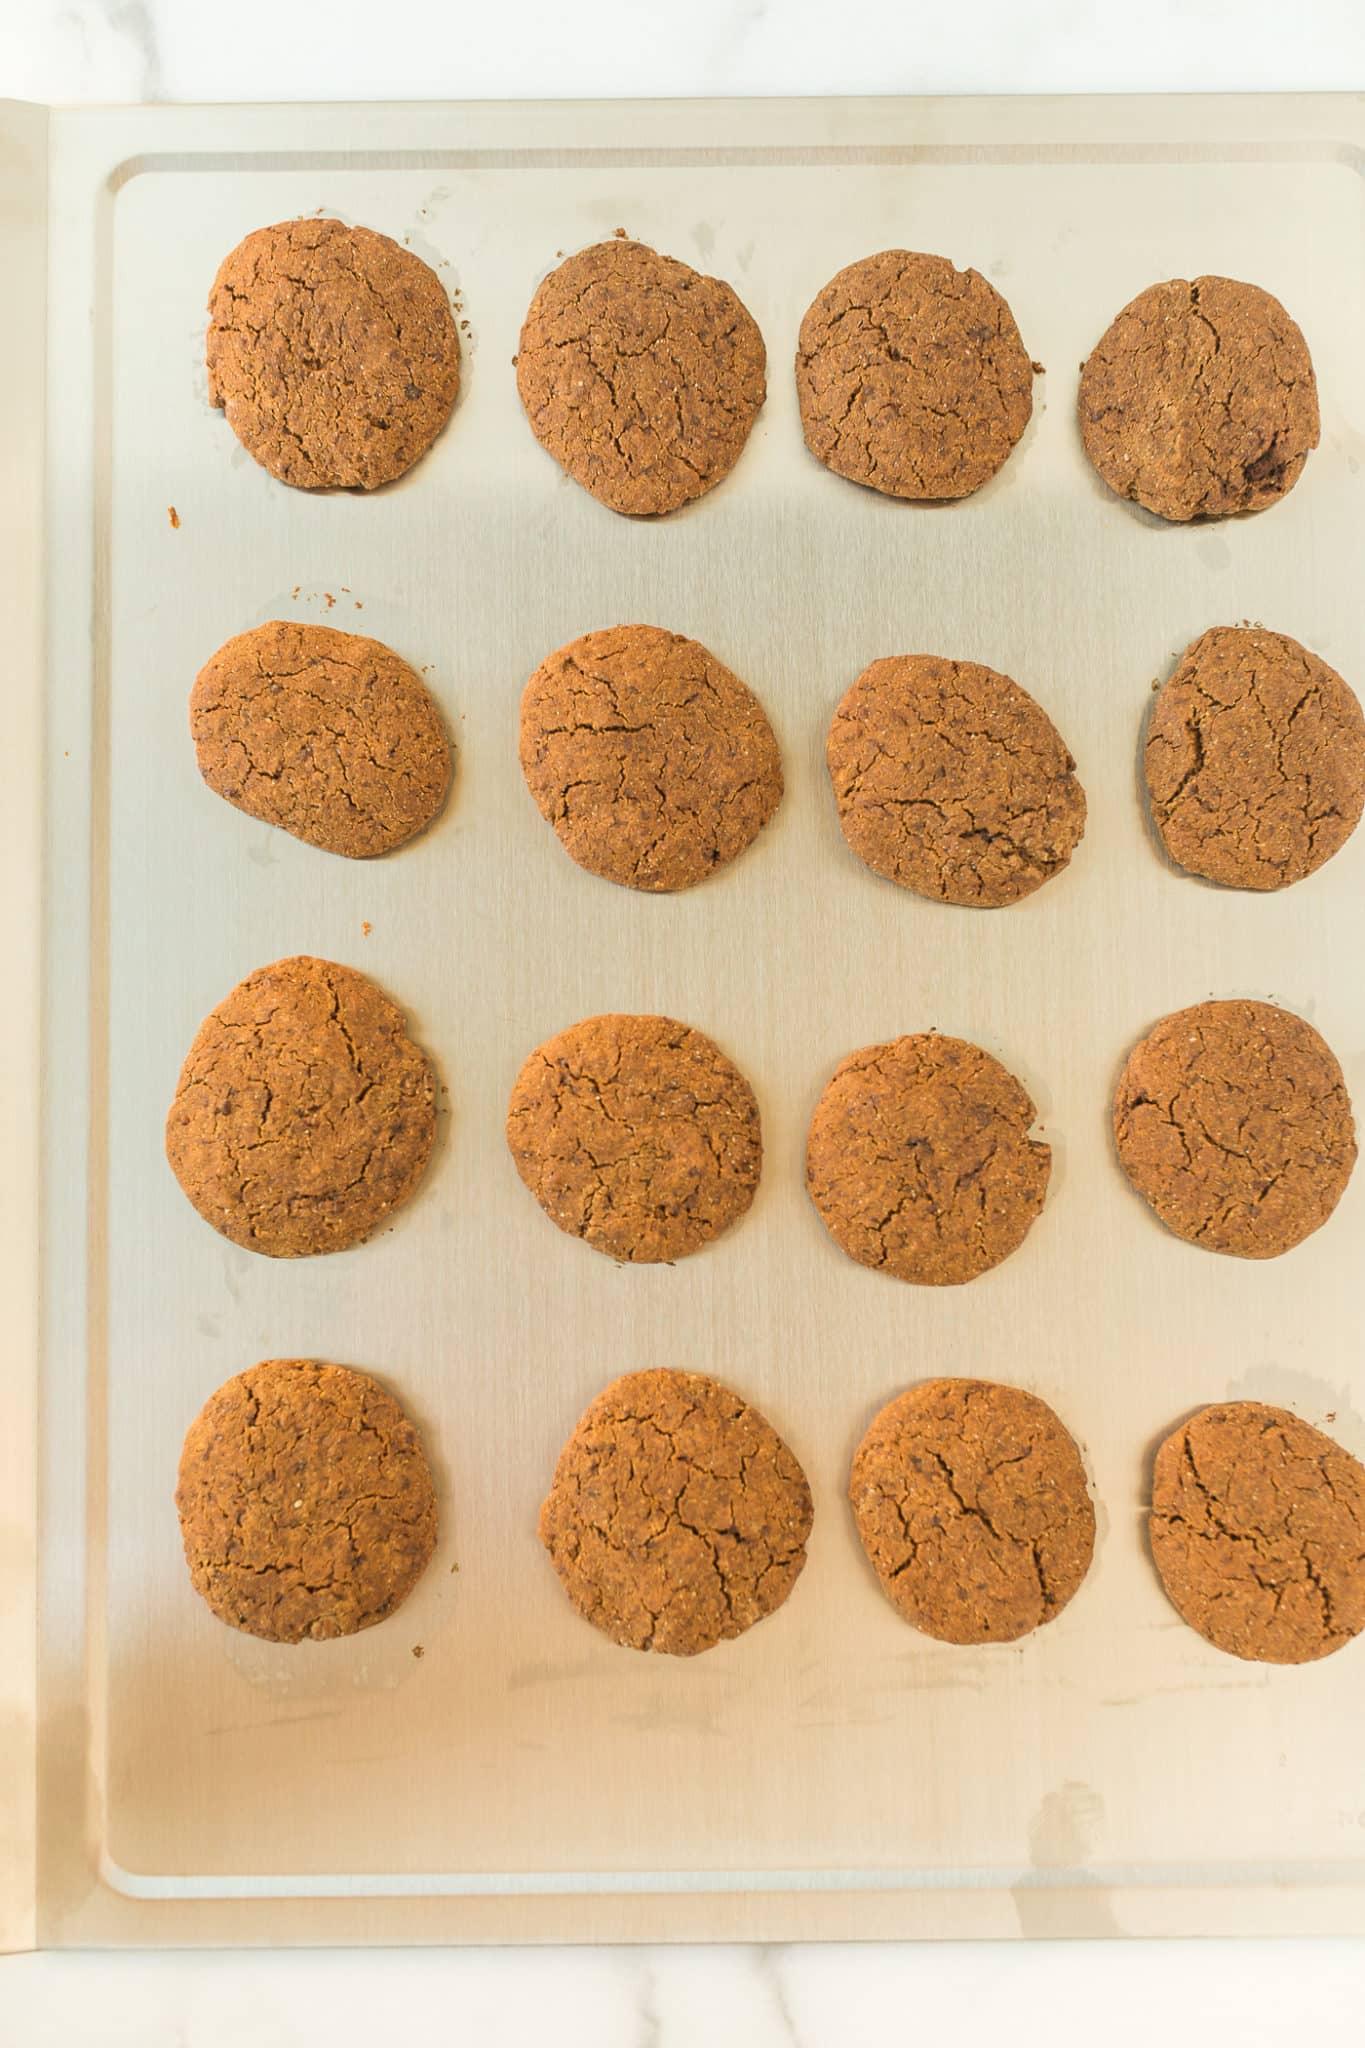 baked molasses cookies on a baking sheet